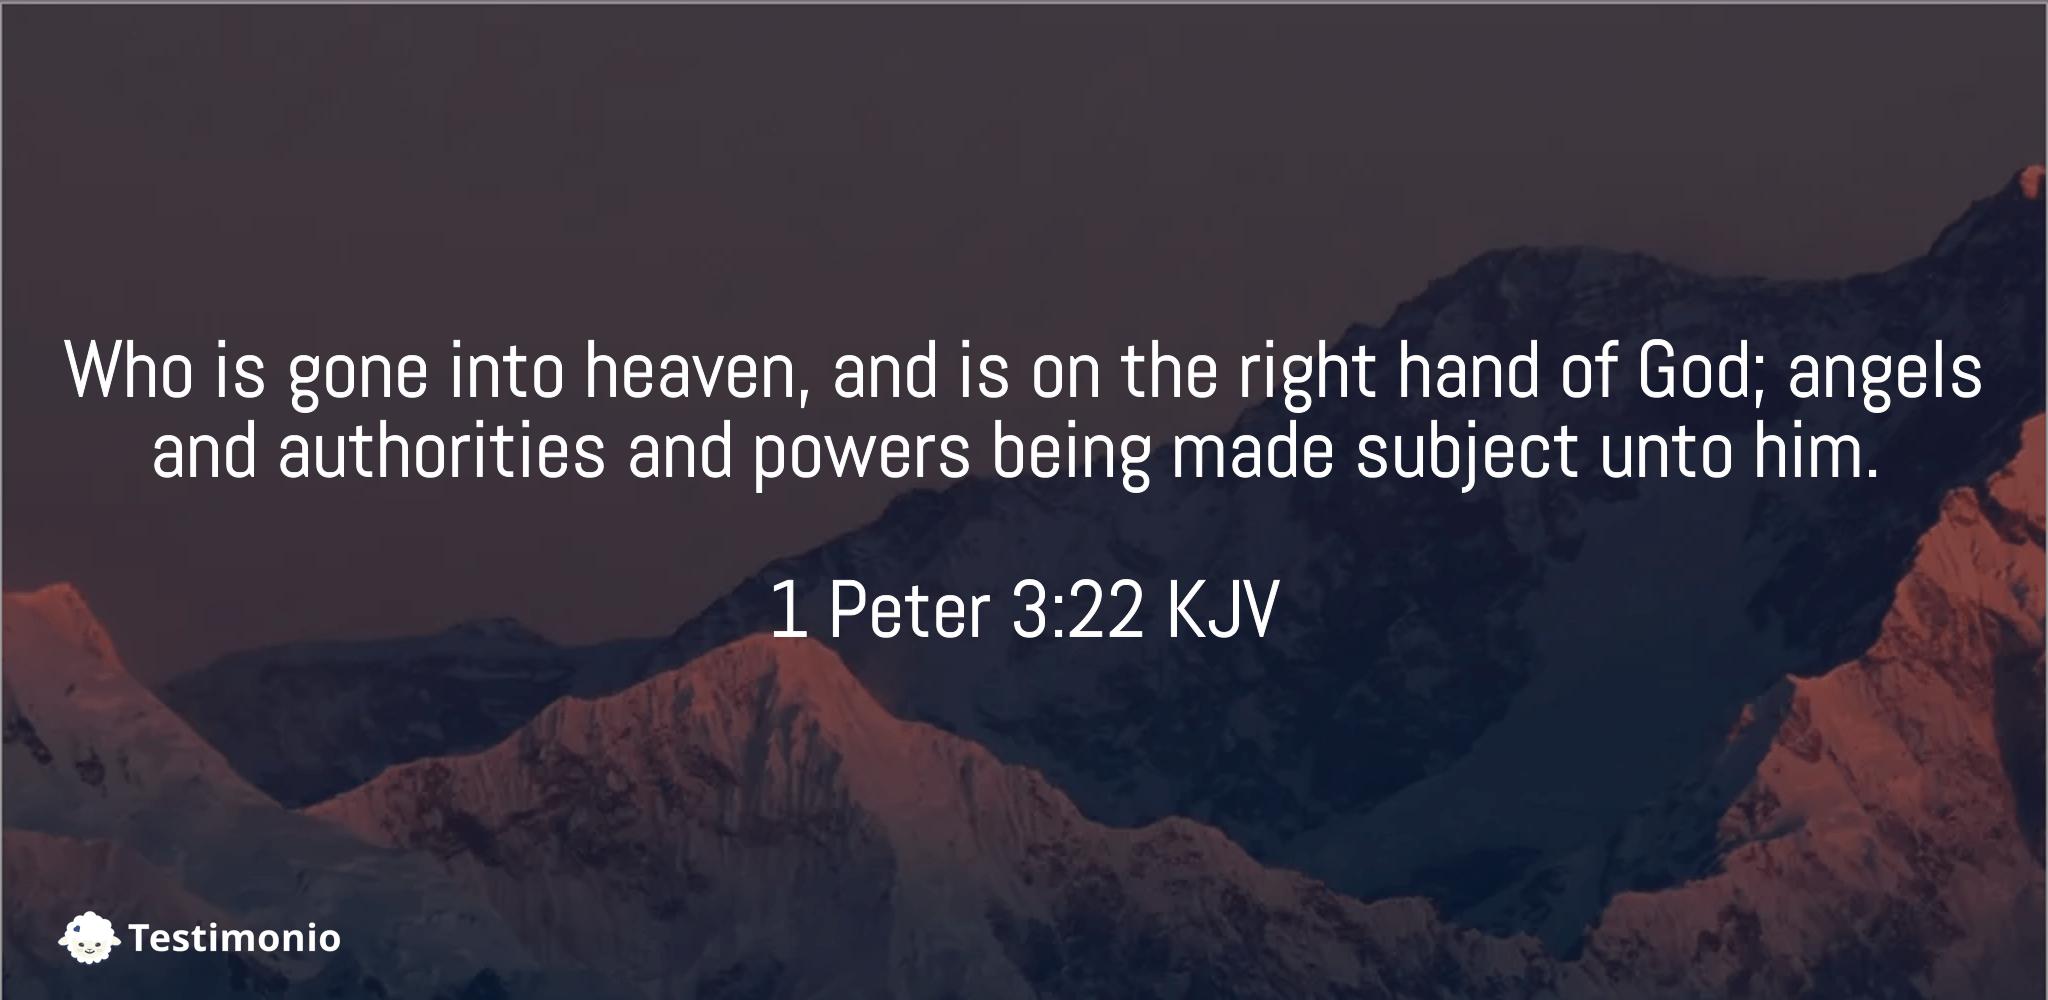 1 Peter 3:22